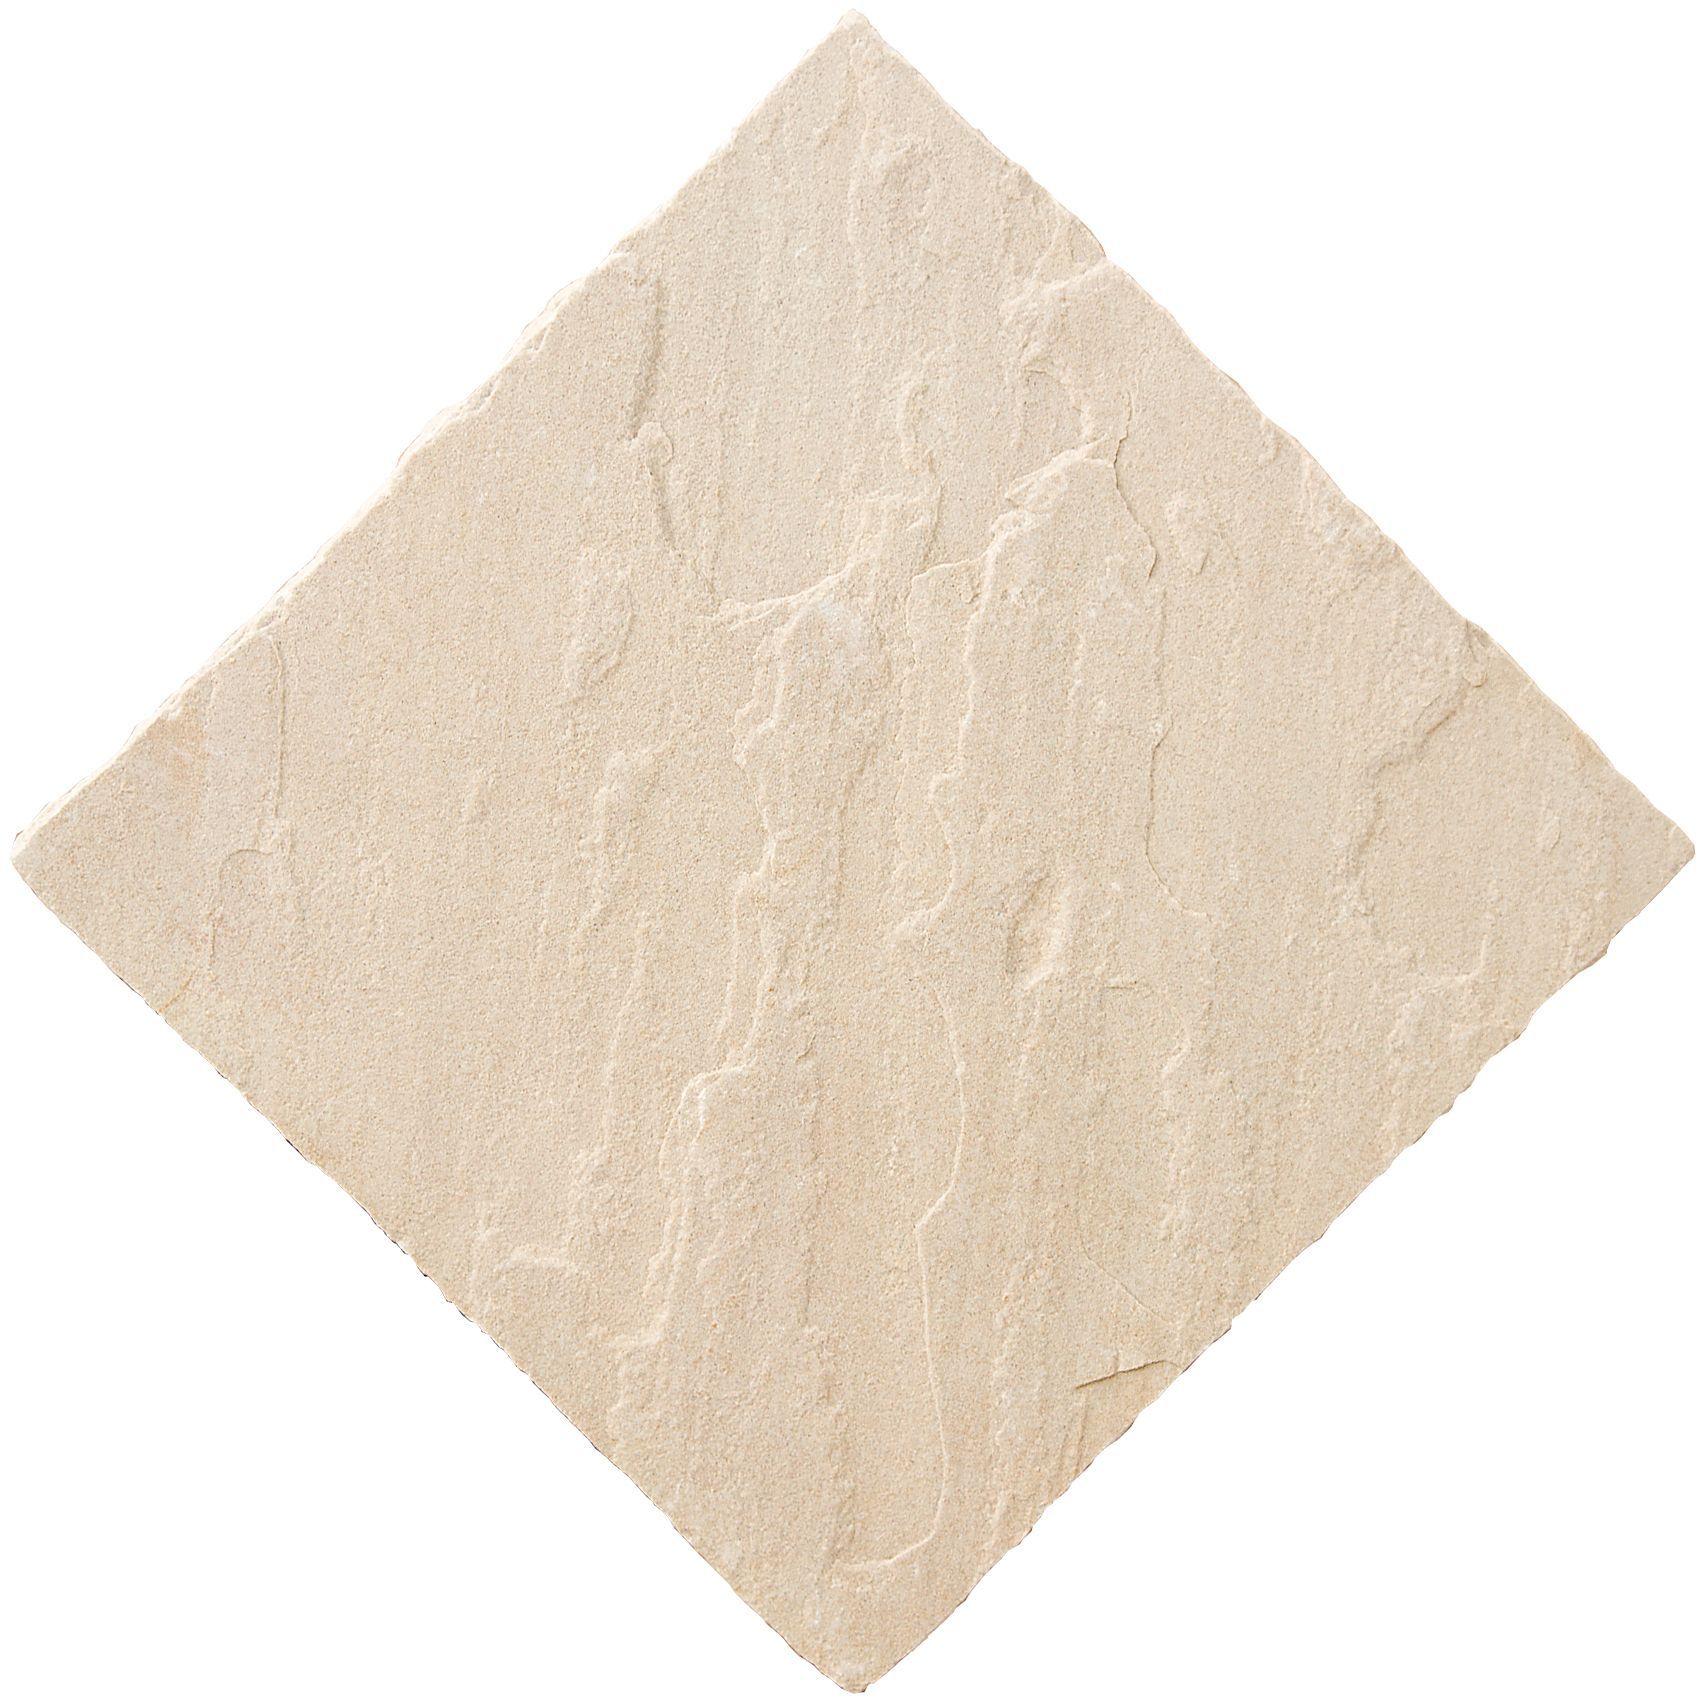 Fossil Buff Natural Sandstone Paving Slab L 600 W 600mm